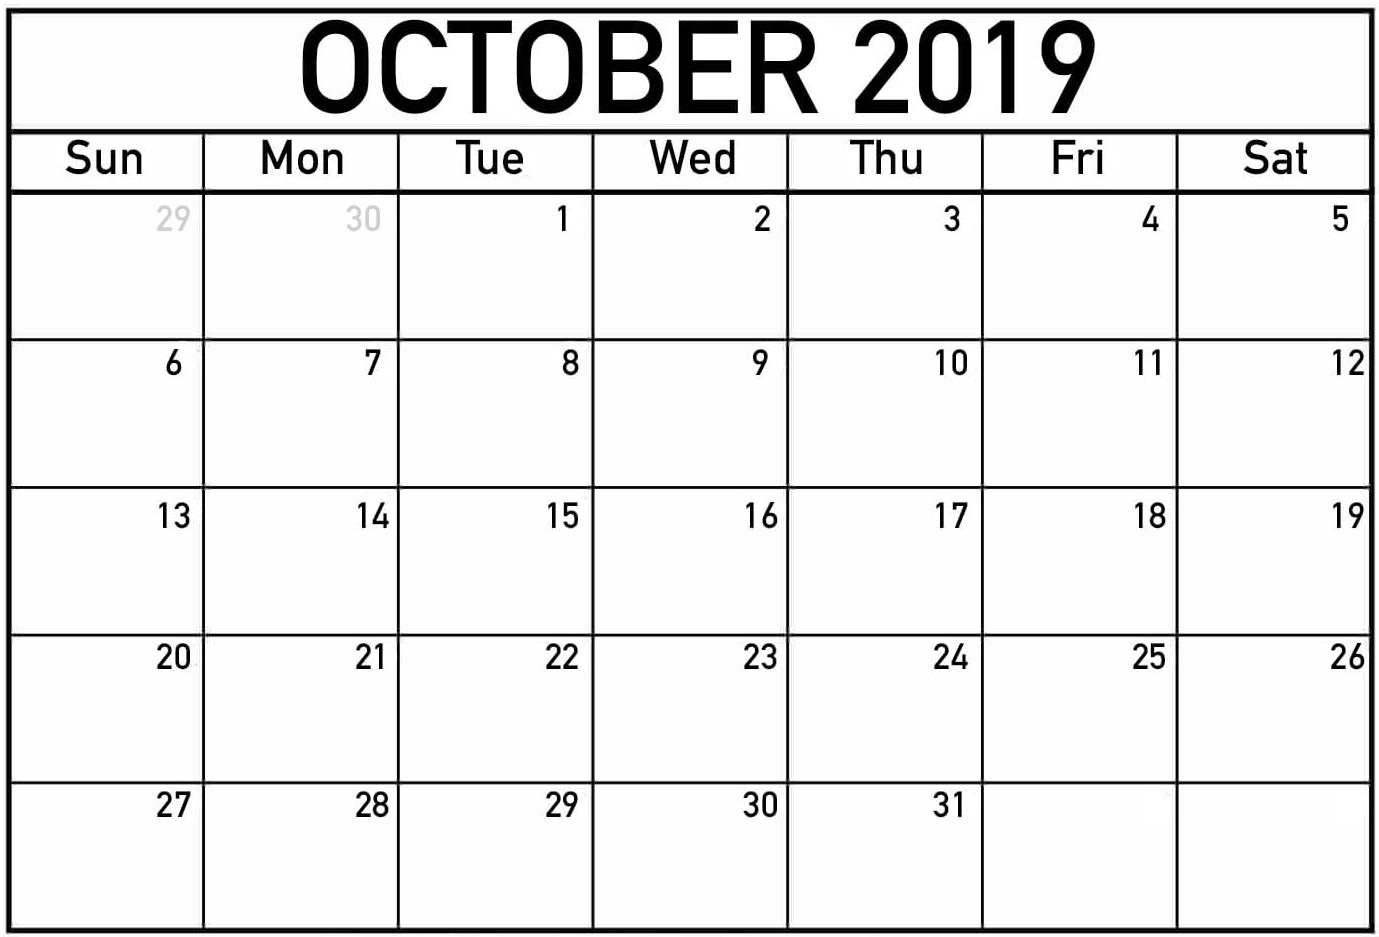 Free Printable October 2019 Calendar Page - 2019 Calendars